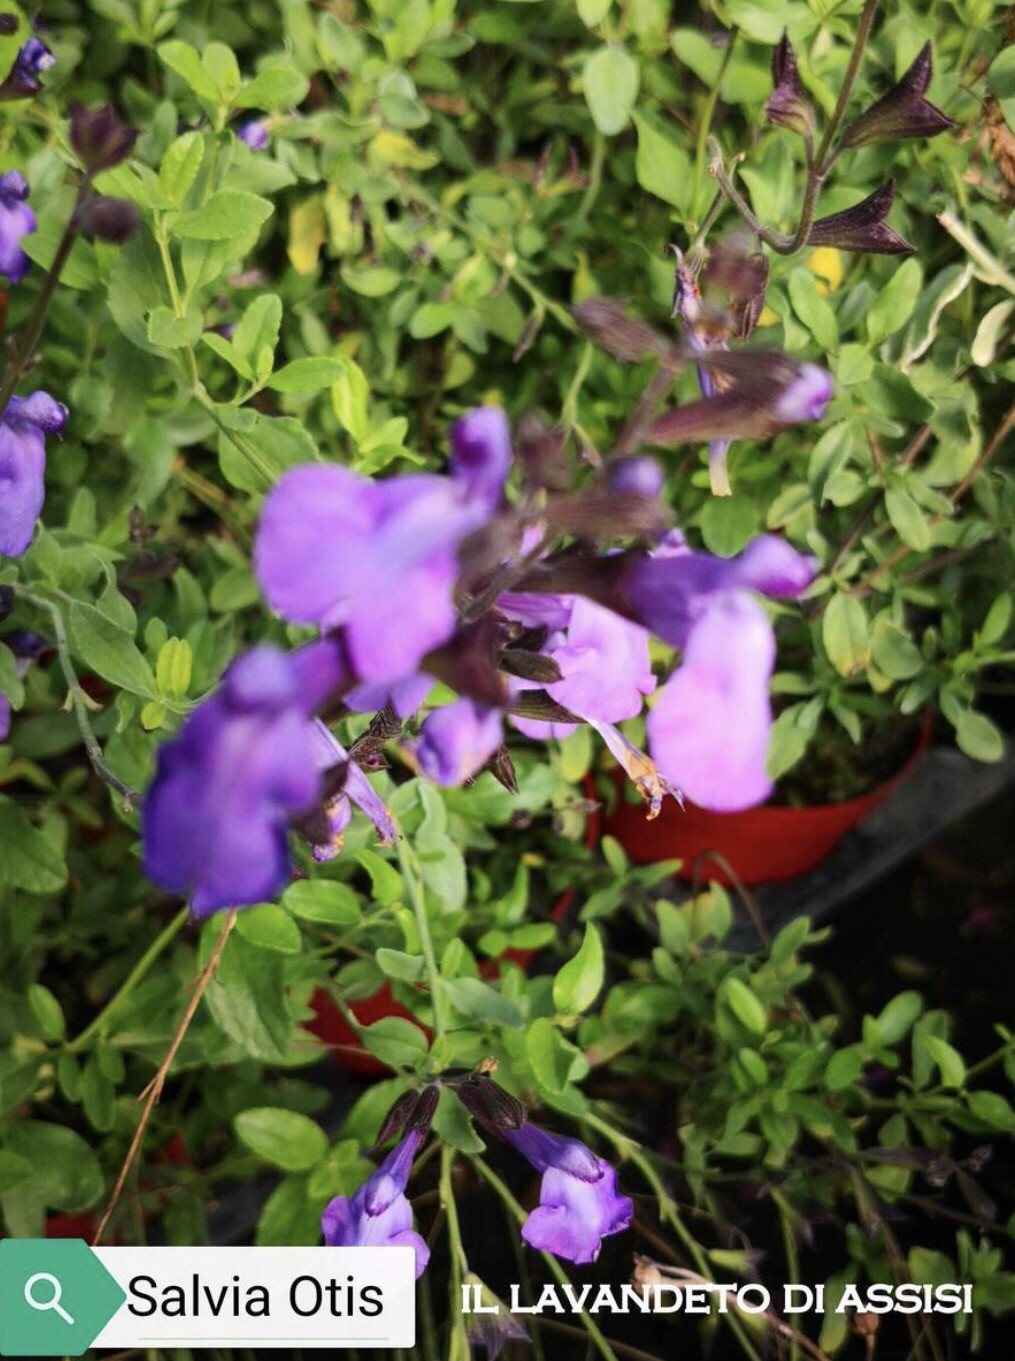 "Salvia "" Otis"" (14 Cm) Ordinare dal sito: https://www.illavandetodiassisi.com/catalogo-vendita-online.html"